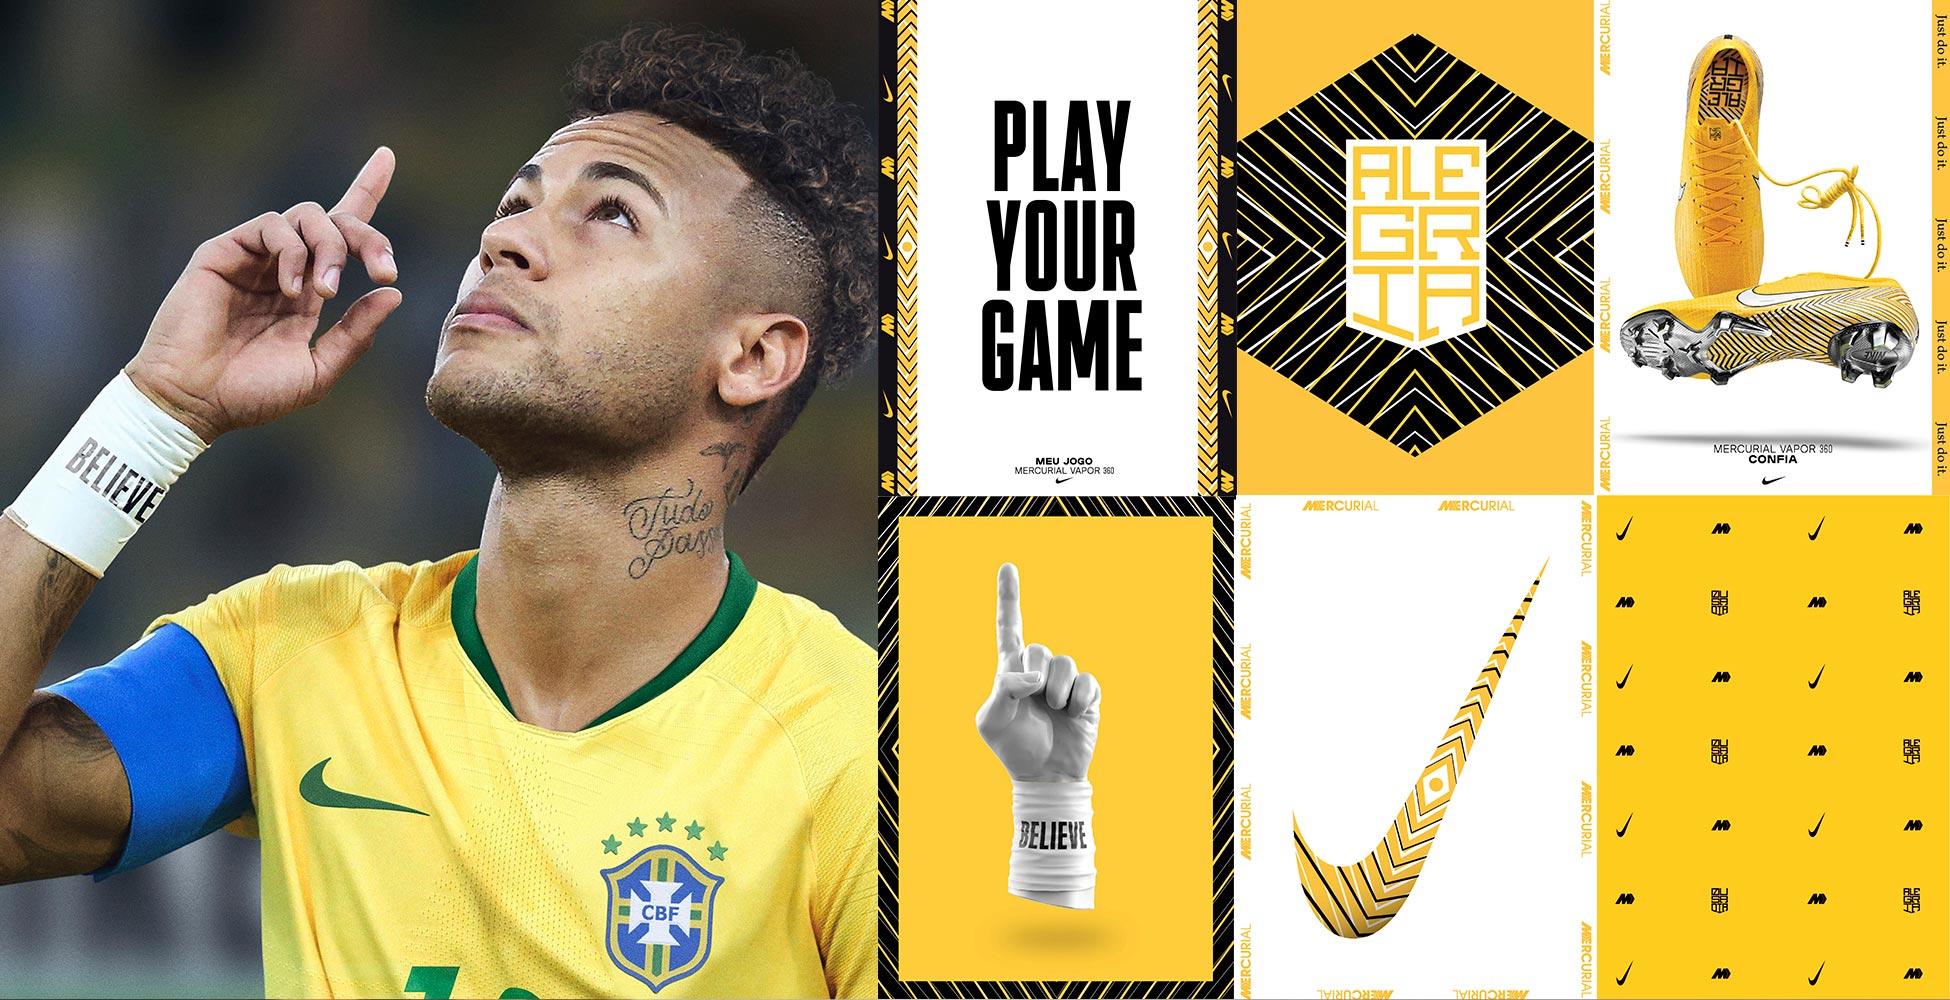 22d2b7d24 Nike Believe Neymar. Play your game - Football store Fútbol Emotion